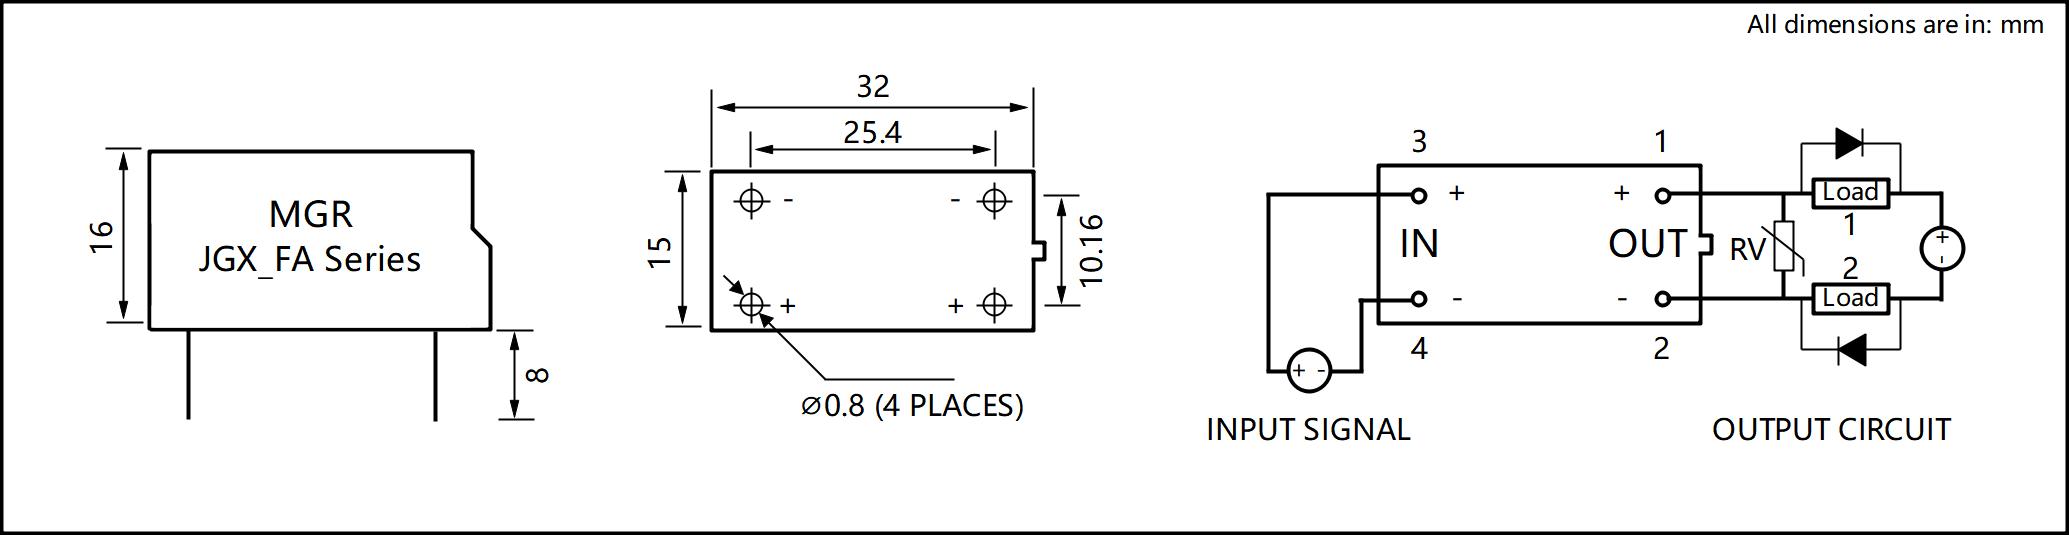 JGX_FA Series Plastic Housing PCB Mount Solid State Relay Circuit Wring Diagram